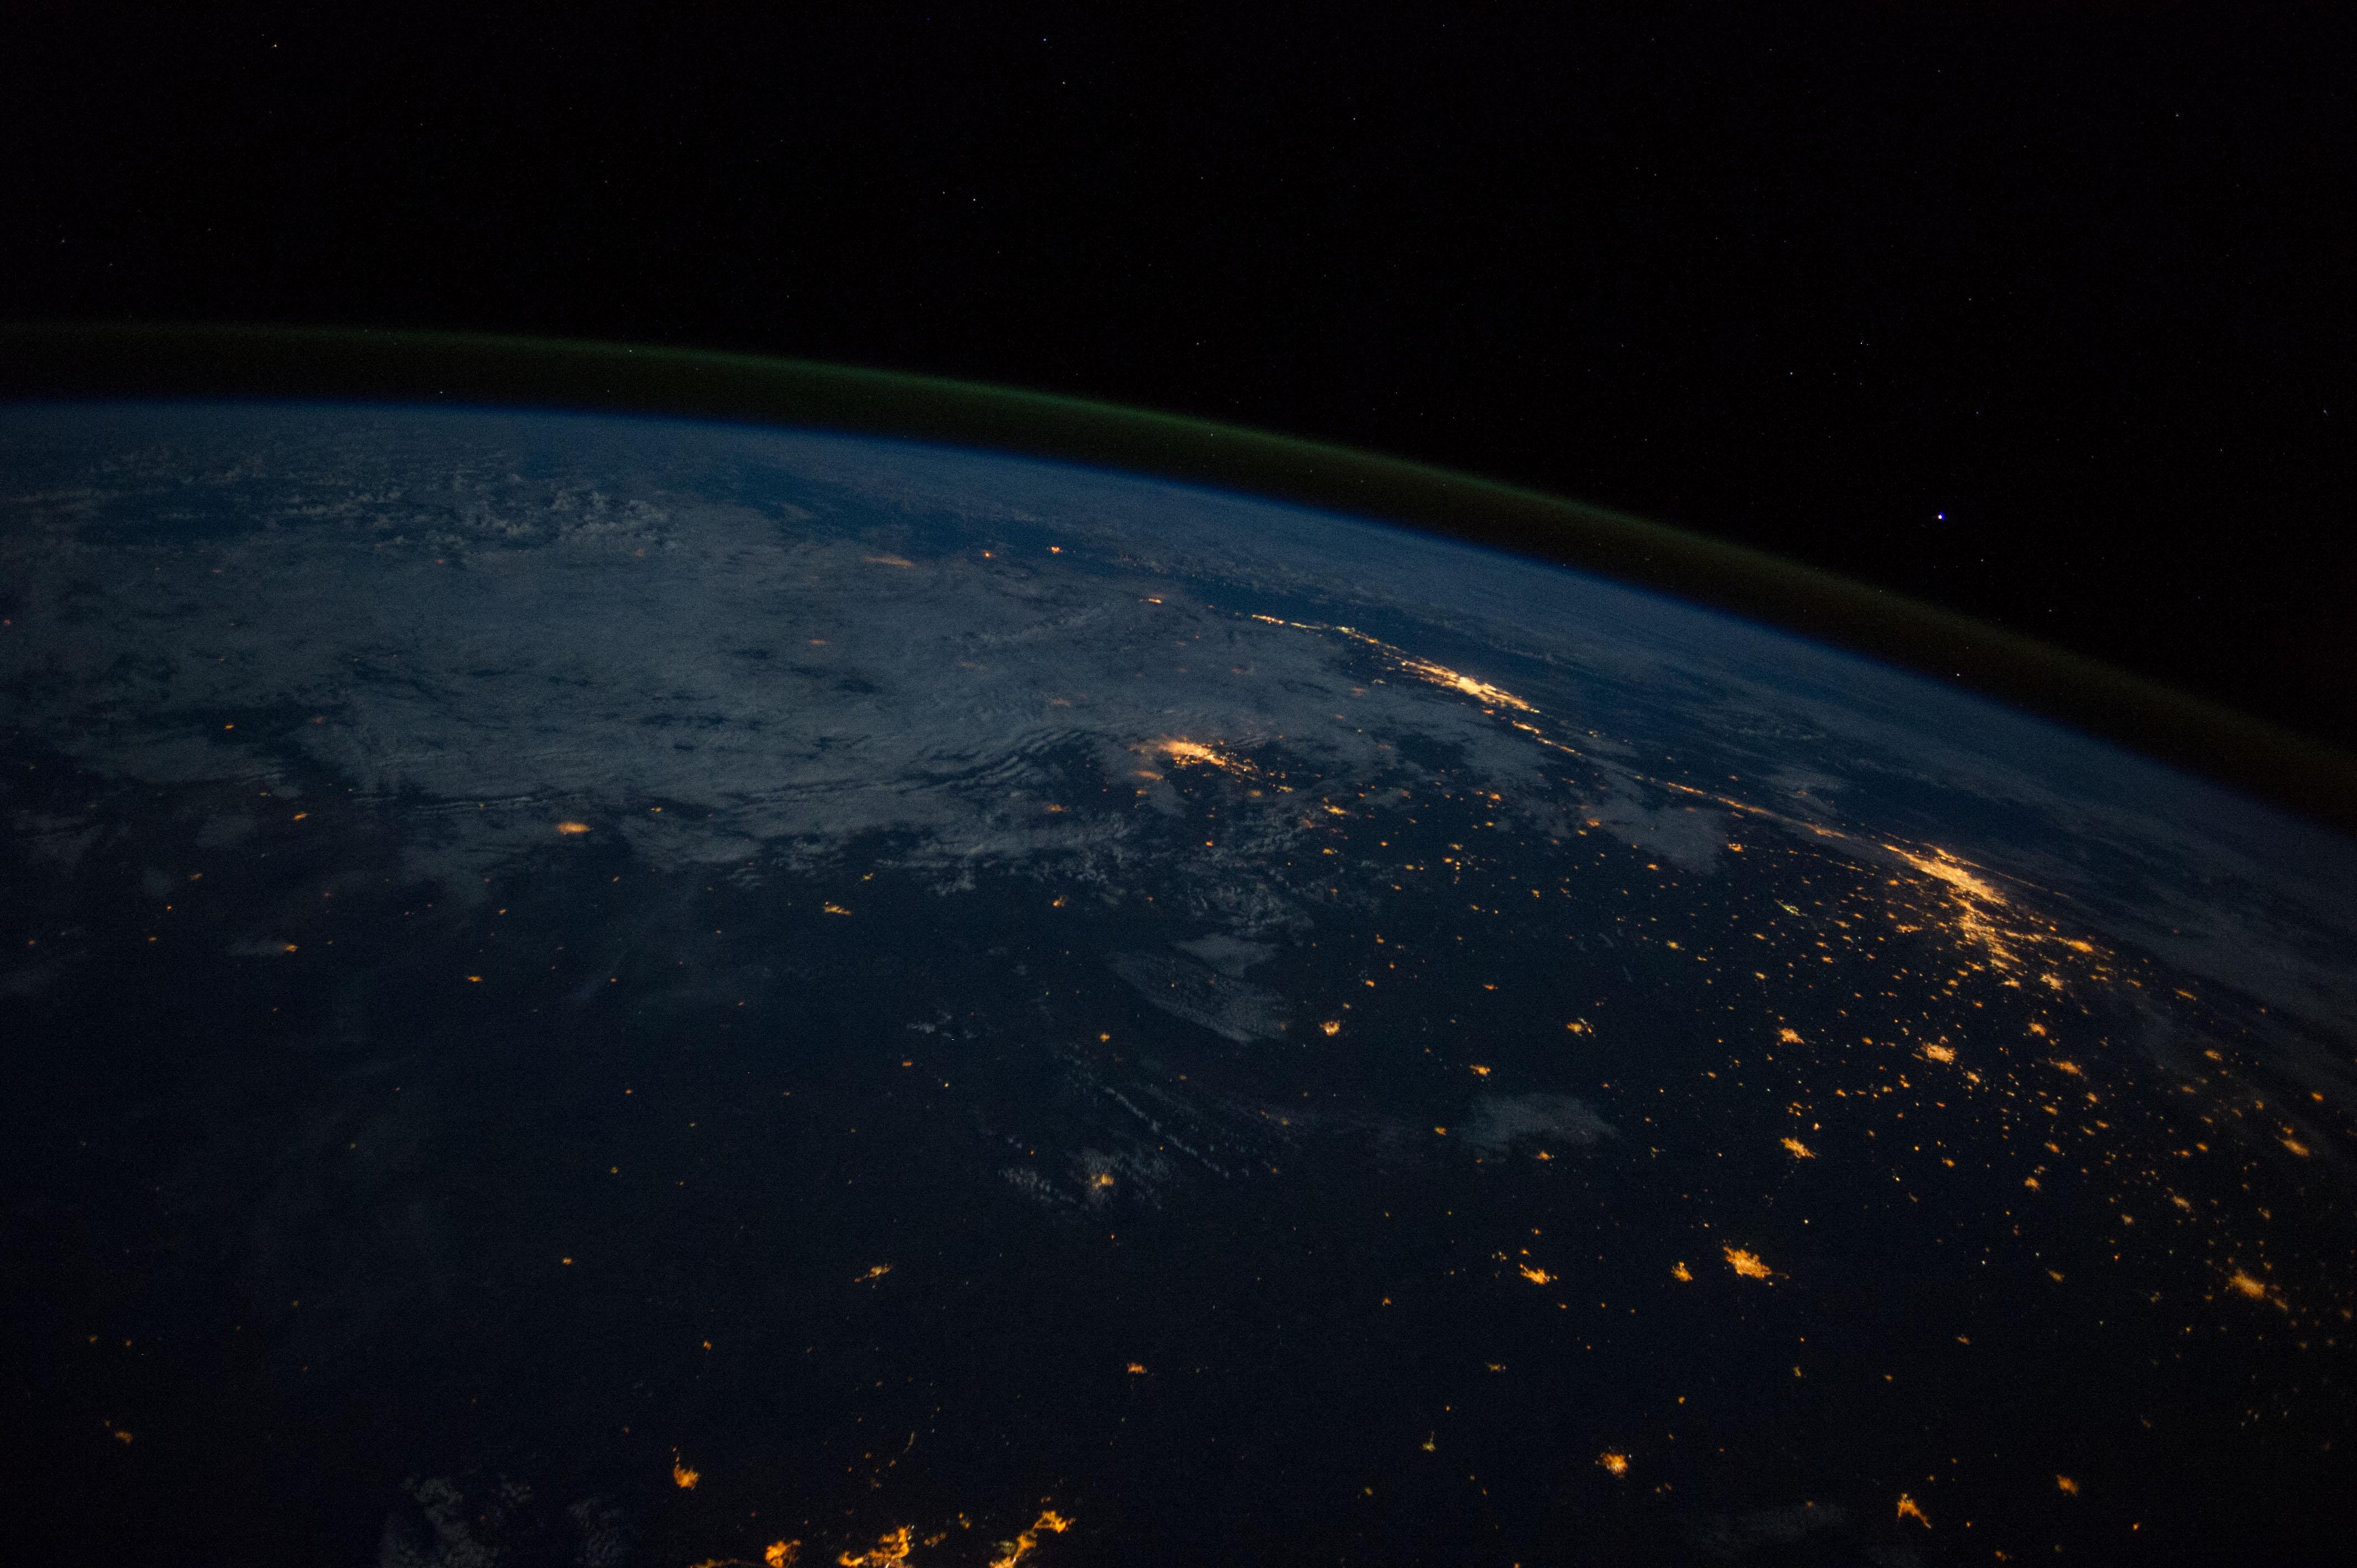 Rio de Janeiro and Sao Paulo From the International Space ...